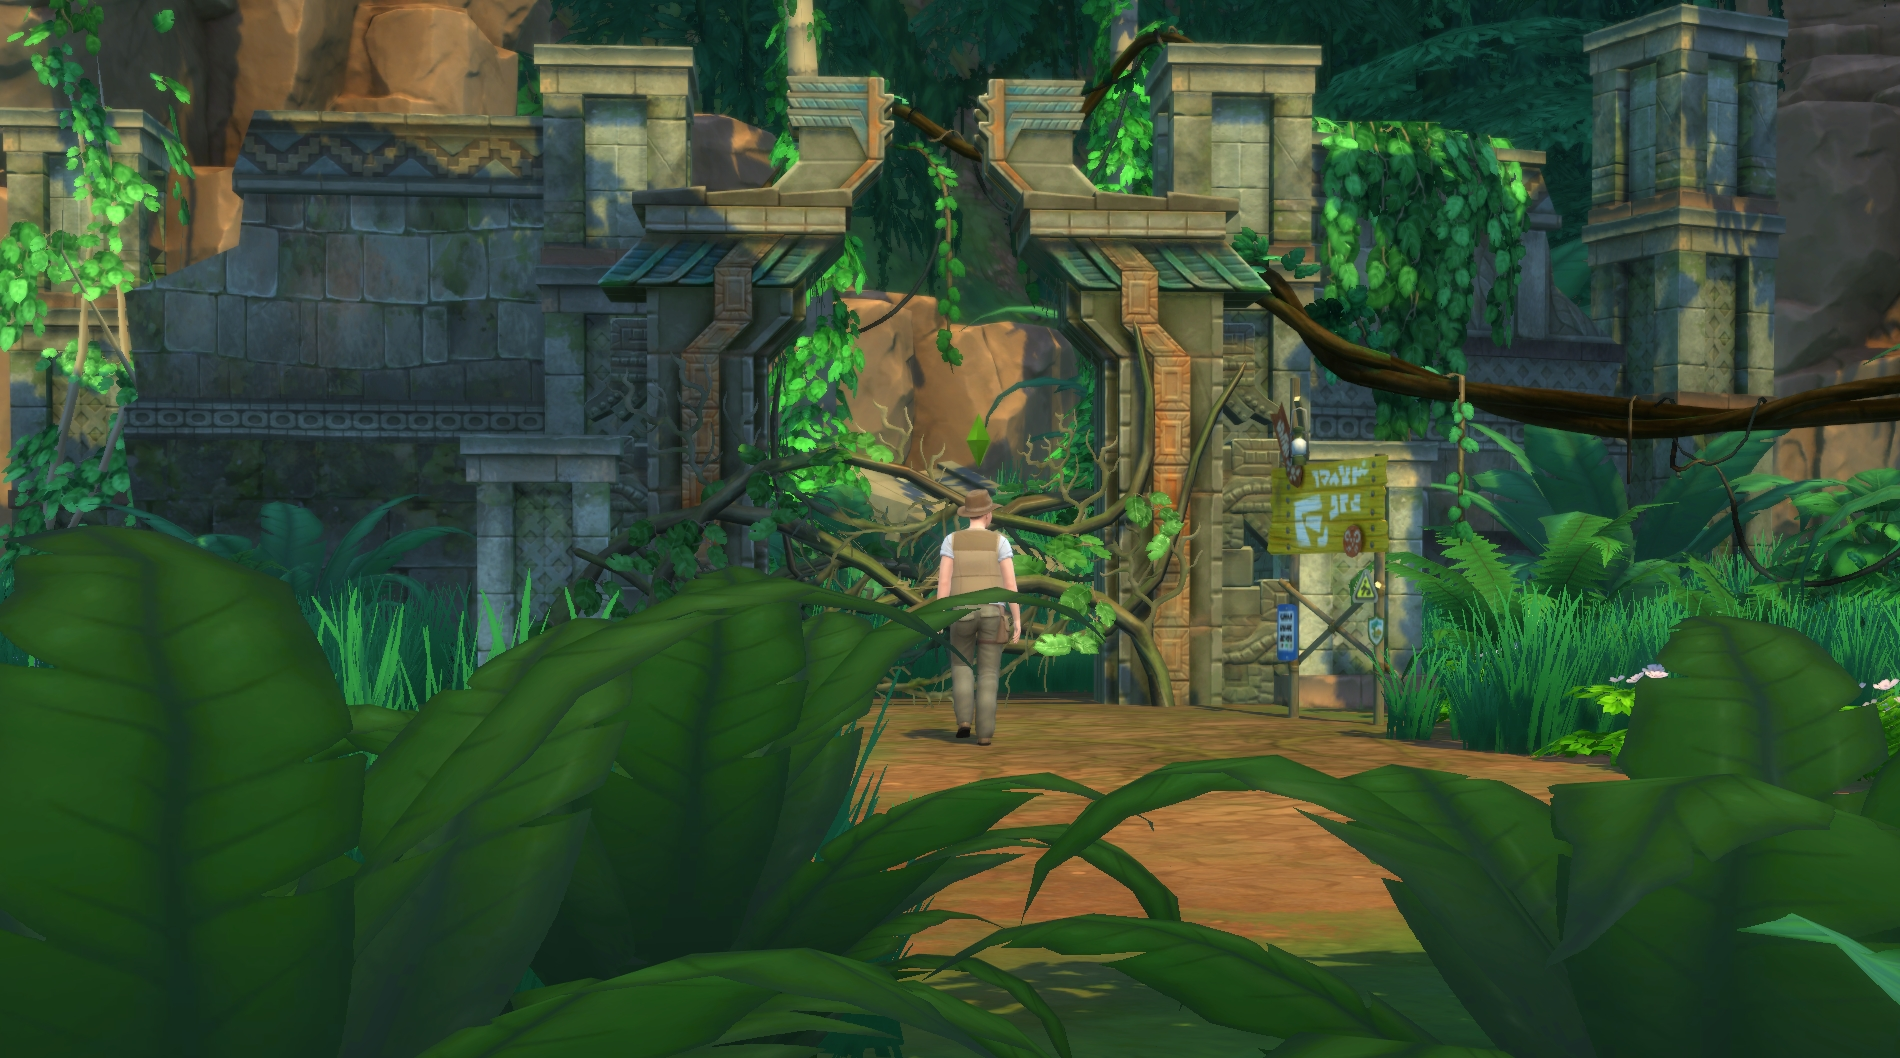 Forest Adventure Island Cam Highdefinition